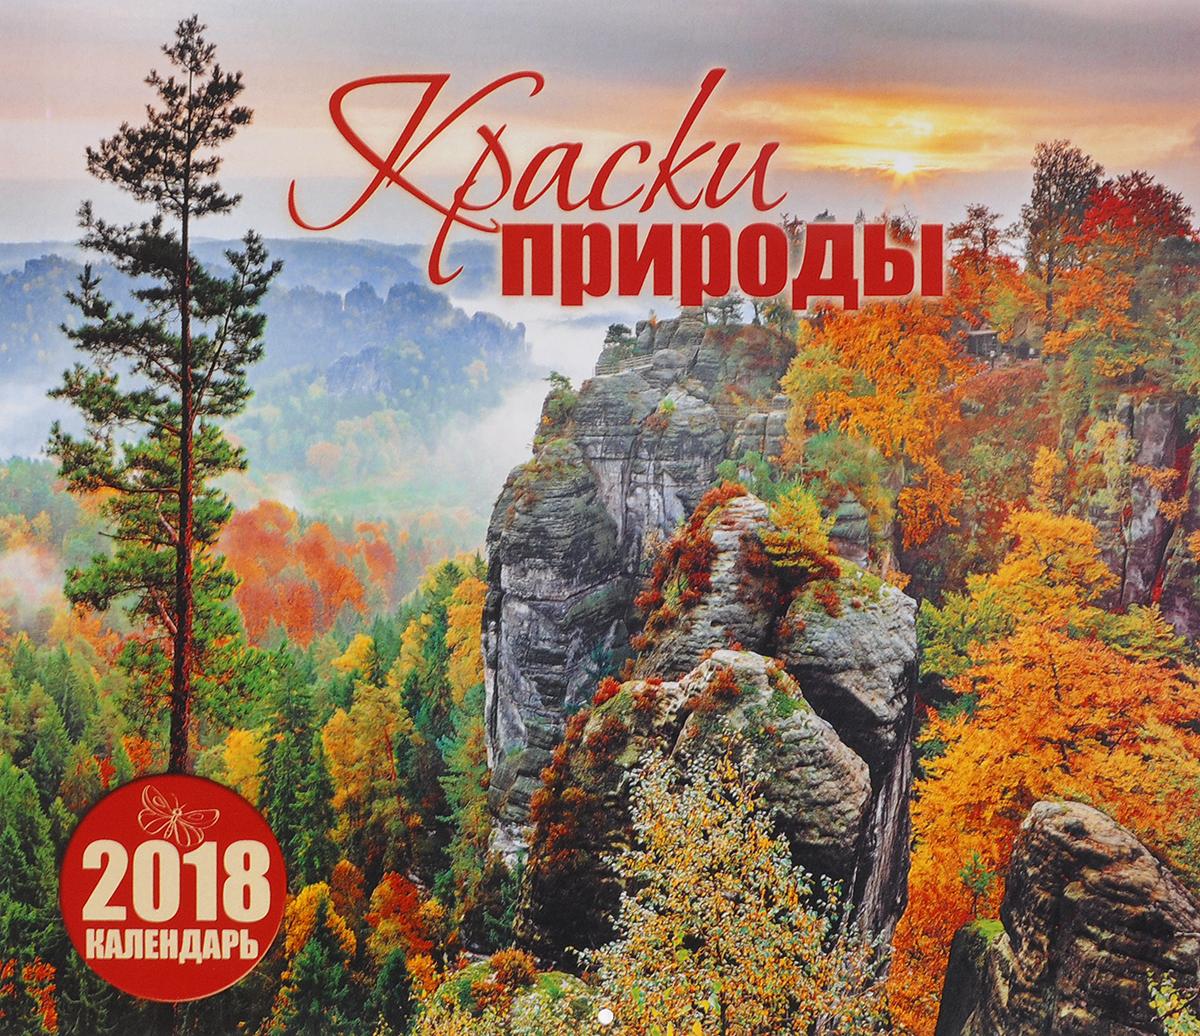 Календарь на 2018 год (на скрепке). Краски природы календарь на 2018 год котята 70805